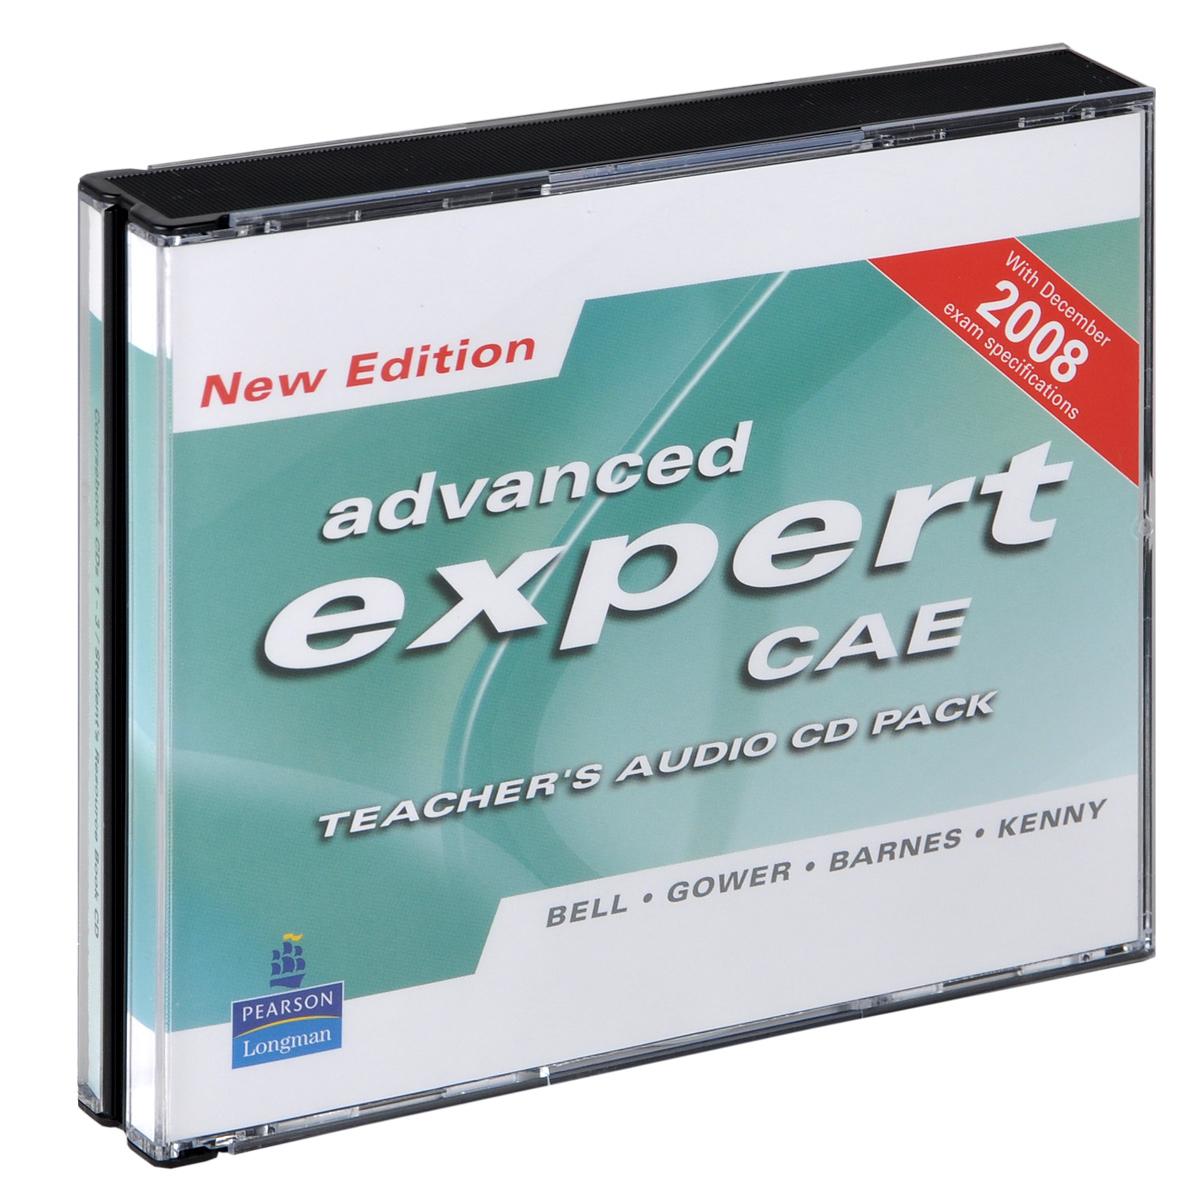 Advanced Expert CAE Teacher's Audio CD Pack (аудиокурс на 4 CD)